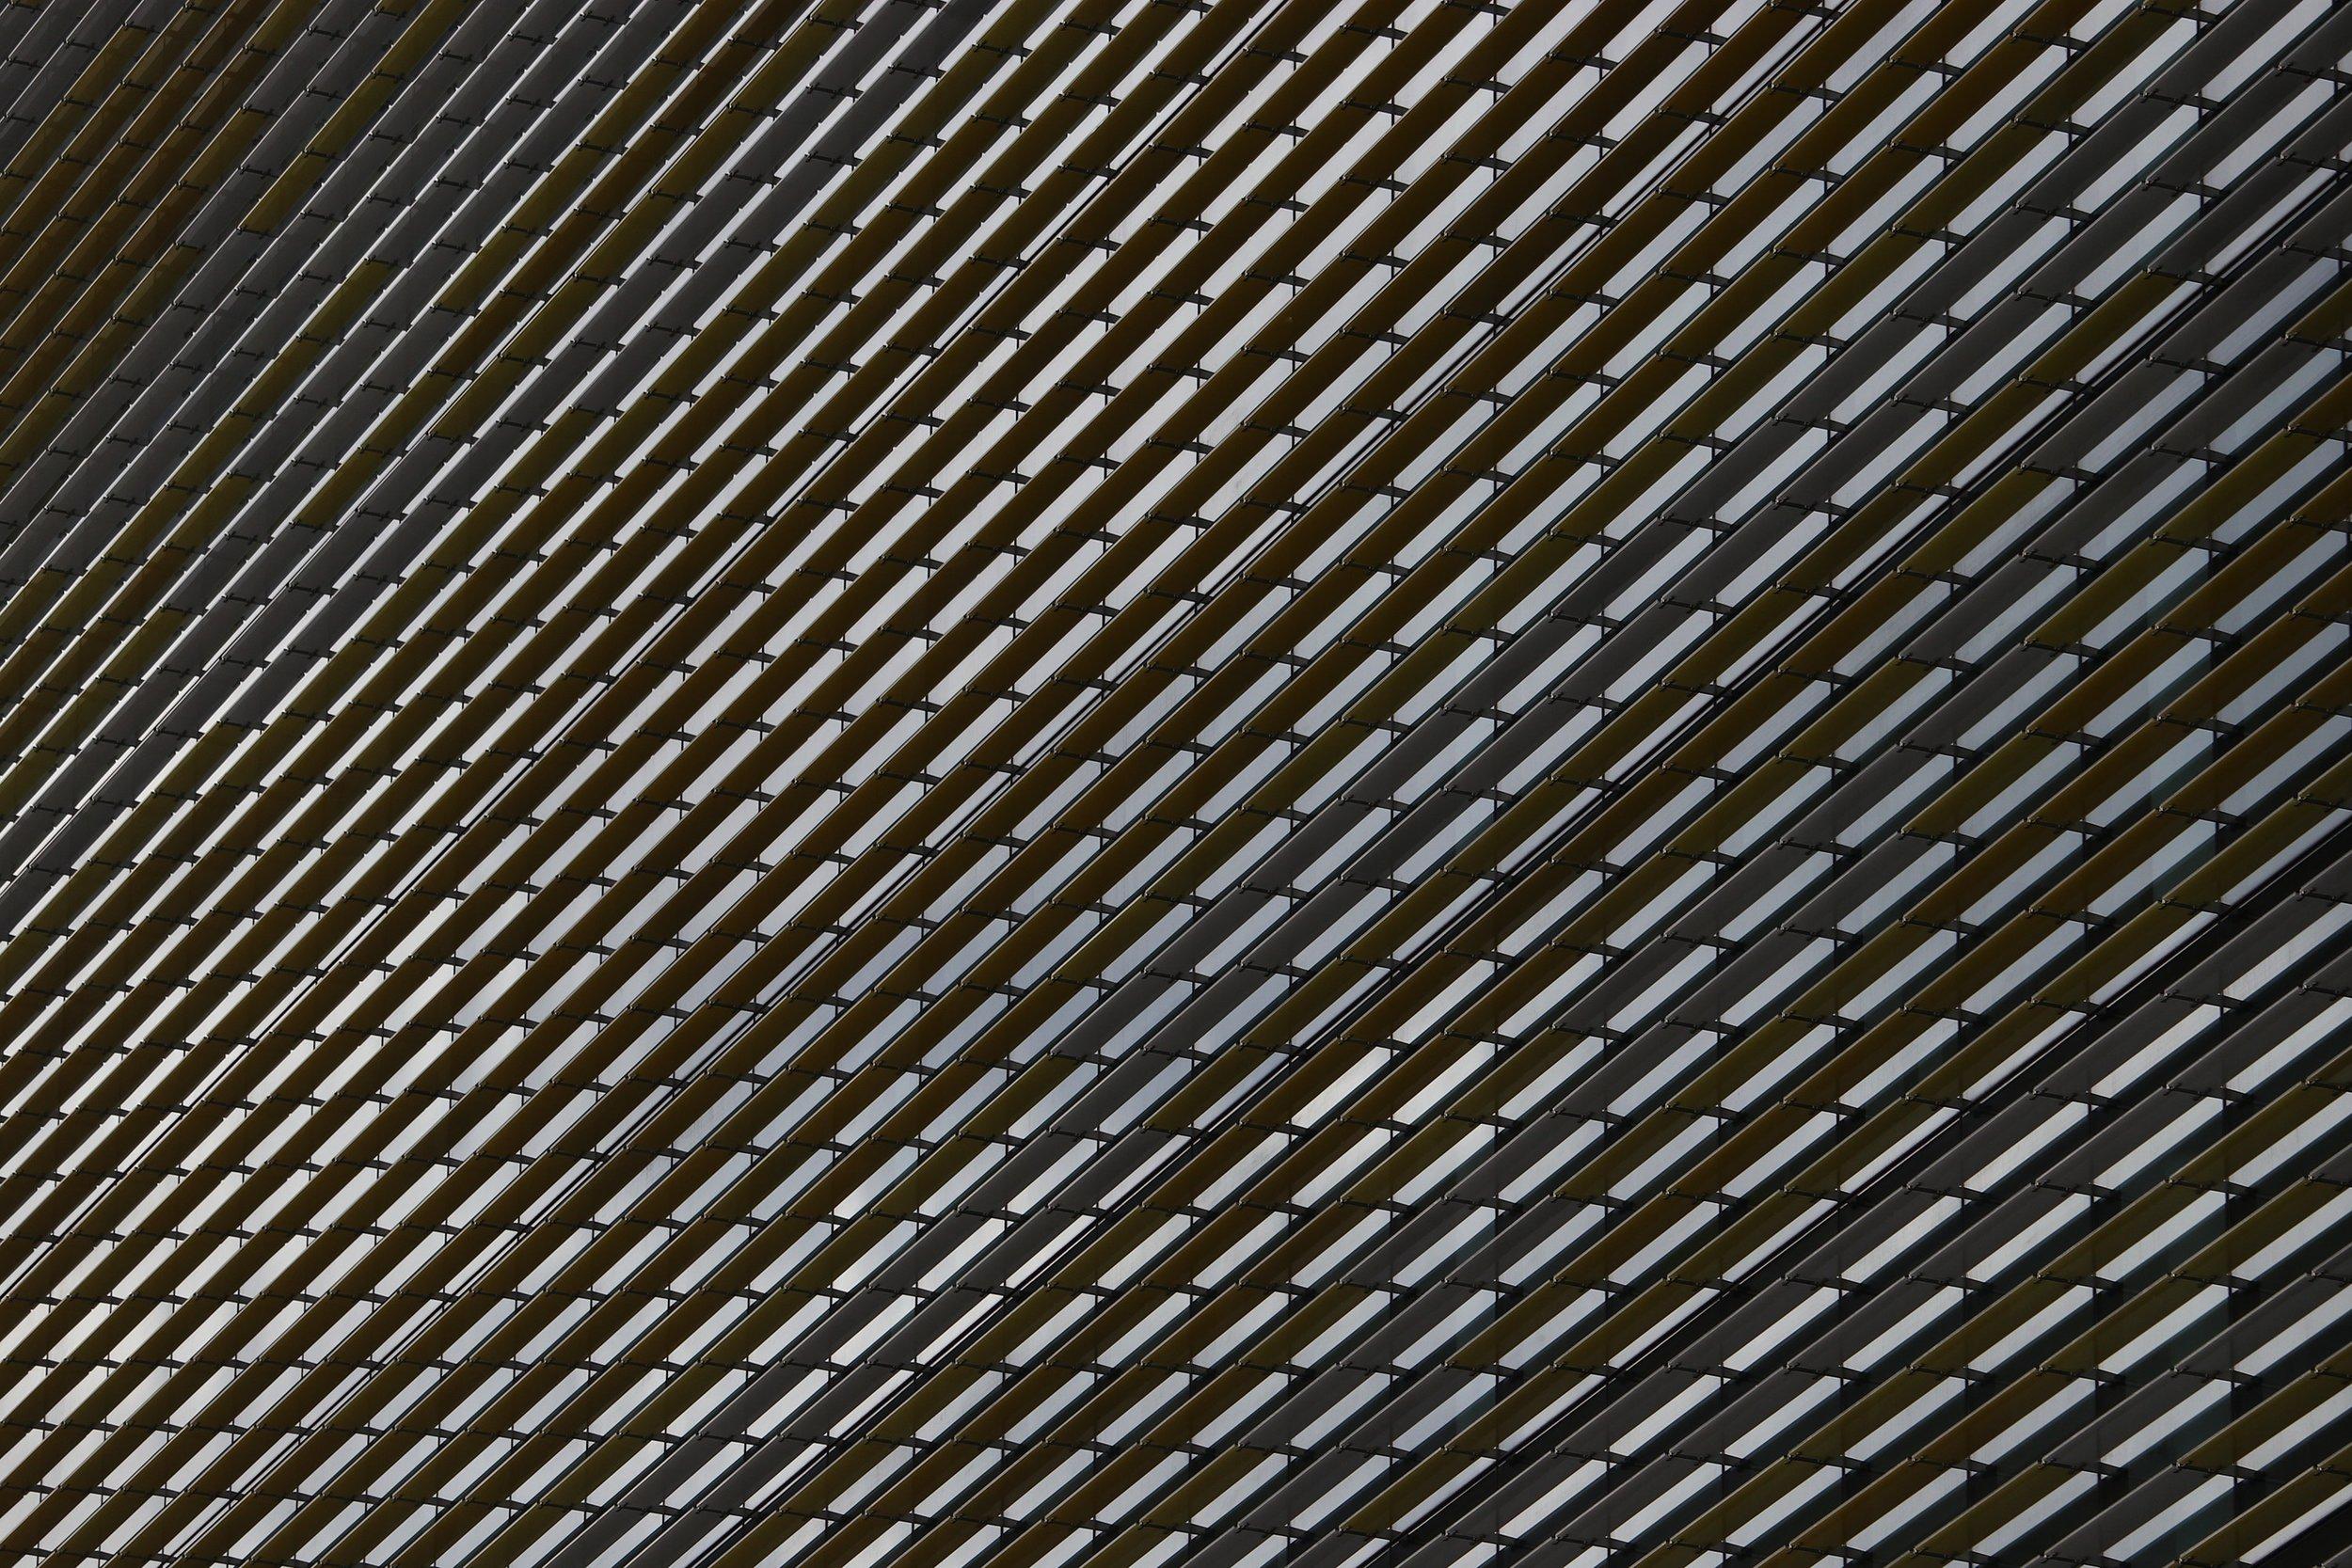 rhys-korbely-228706.jpg